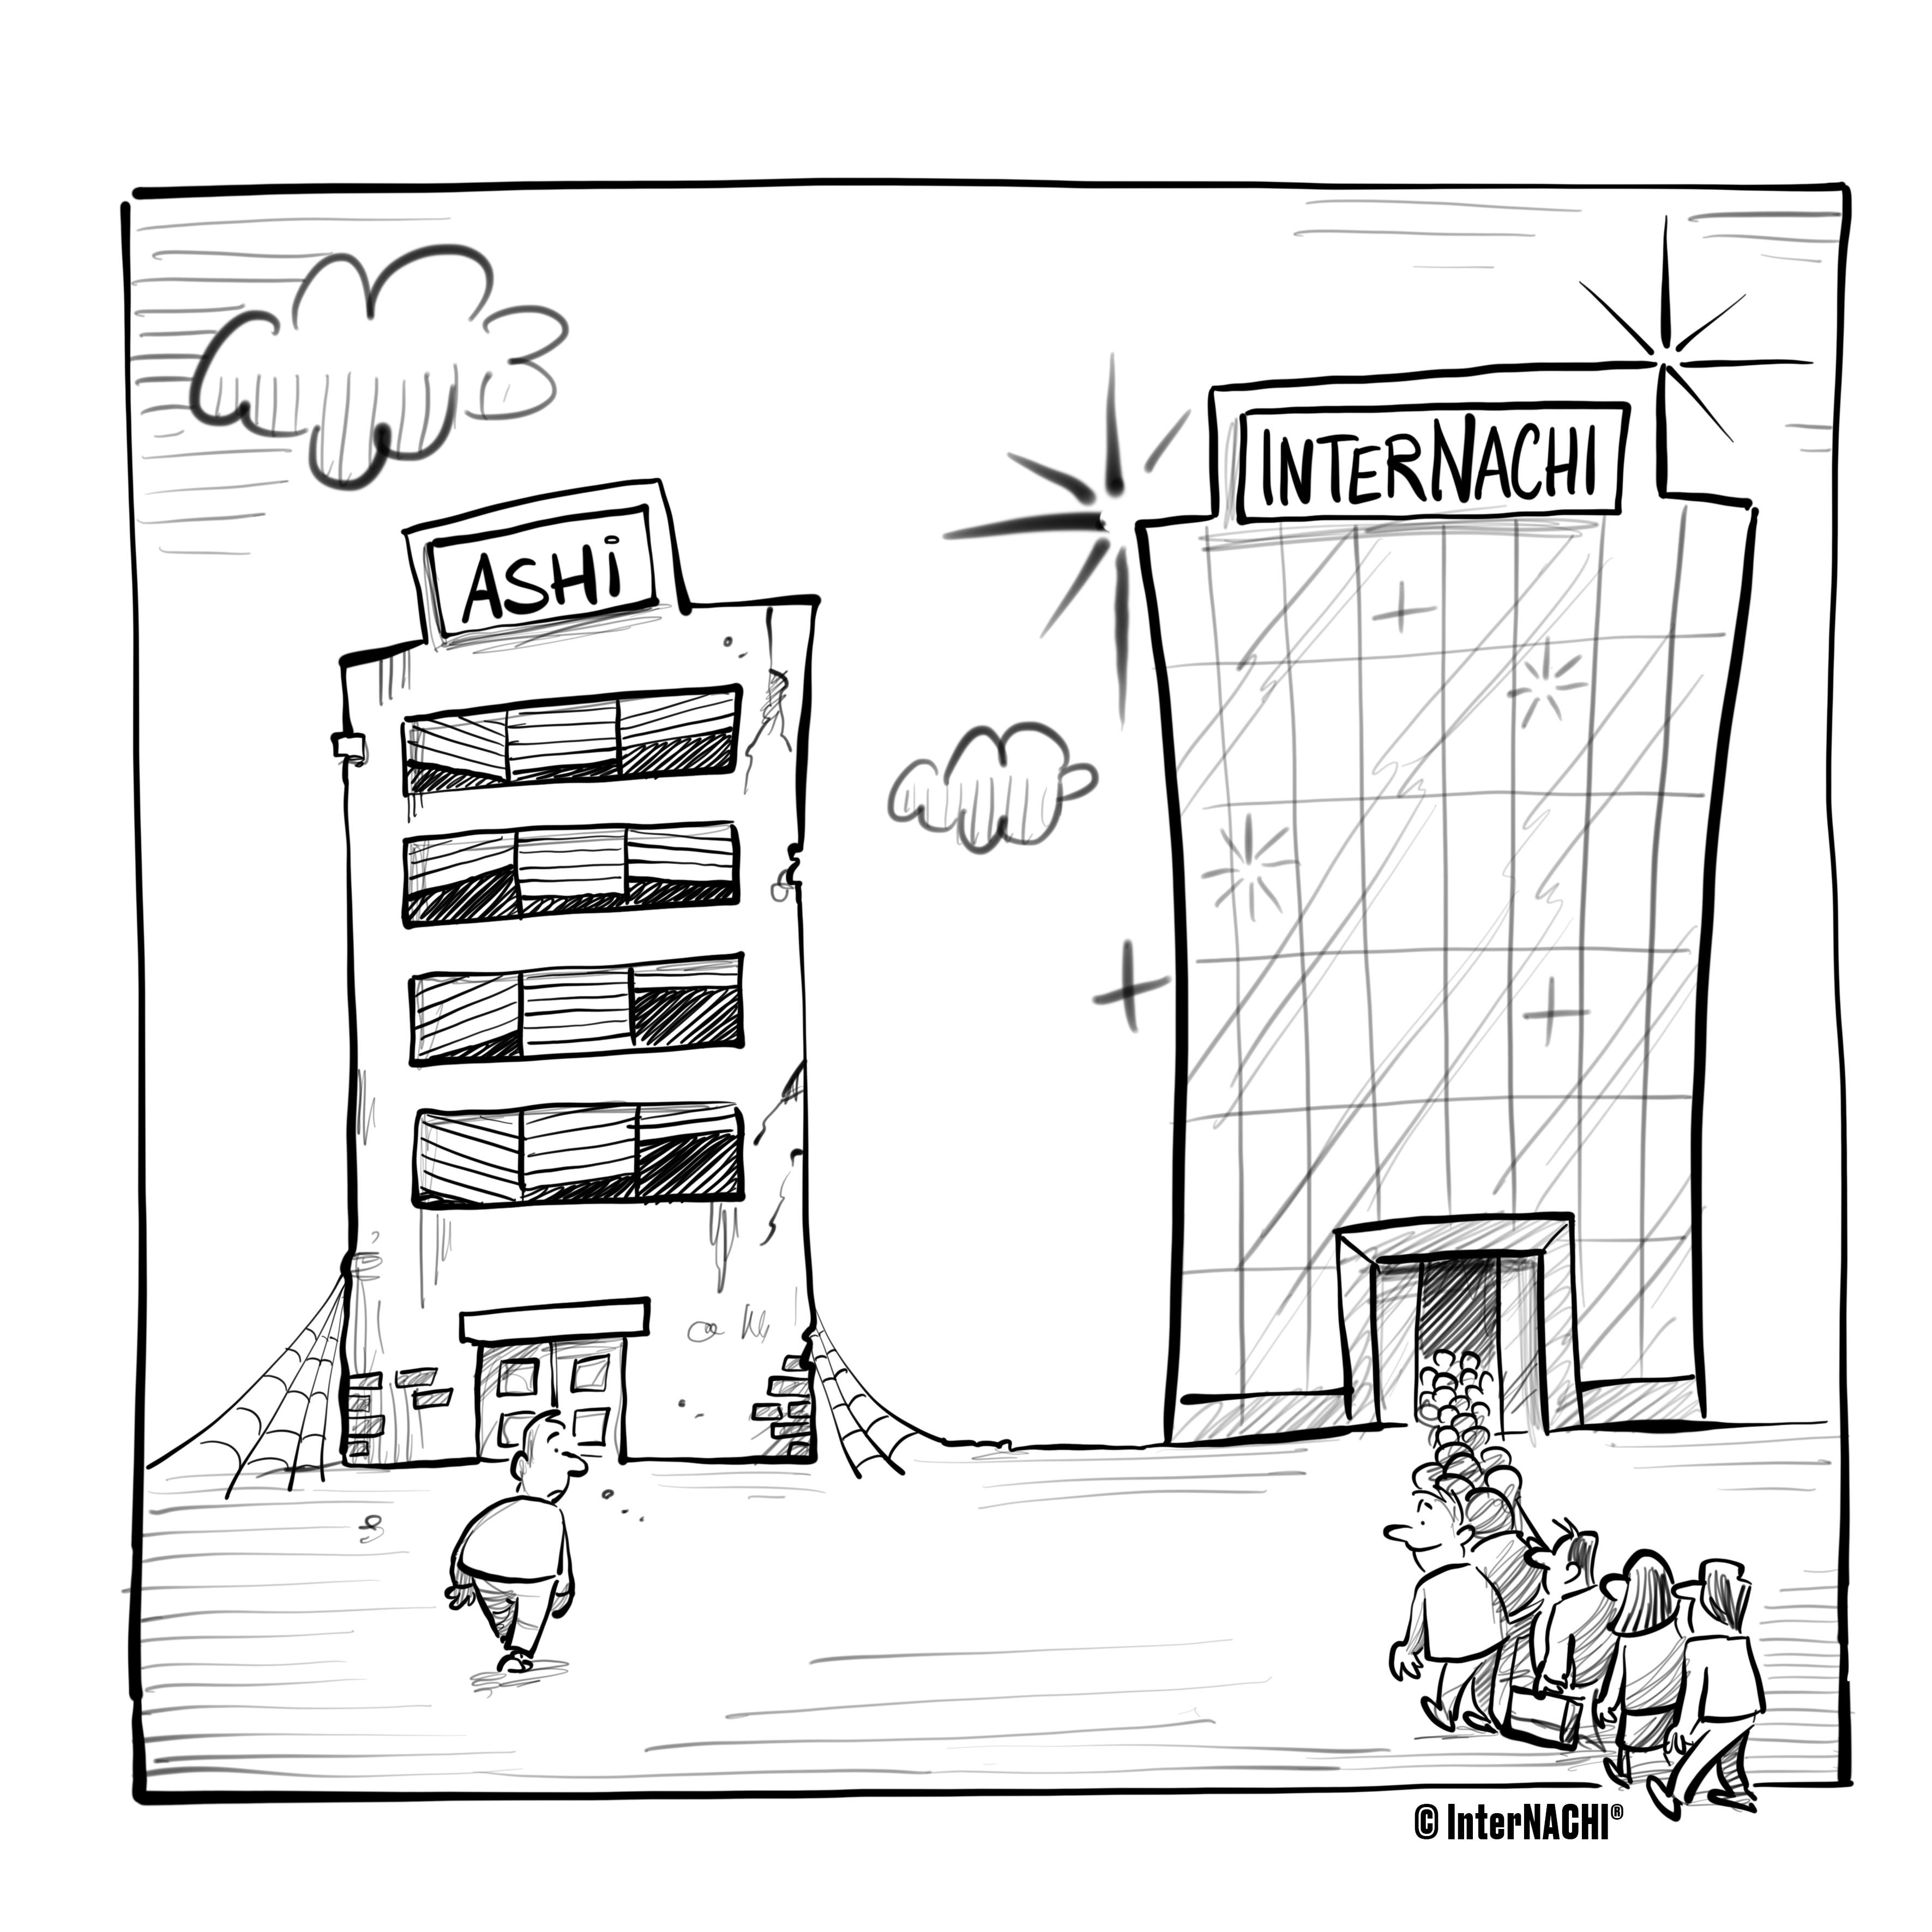 InterNACHI® vs. ASHI Inspection Cartoon